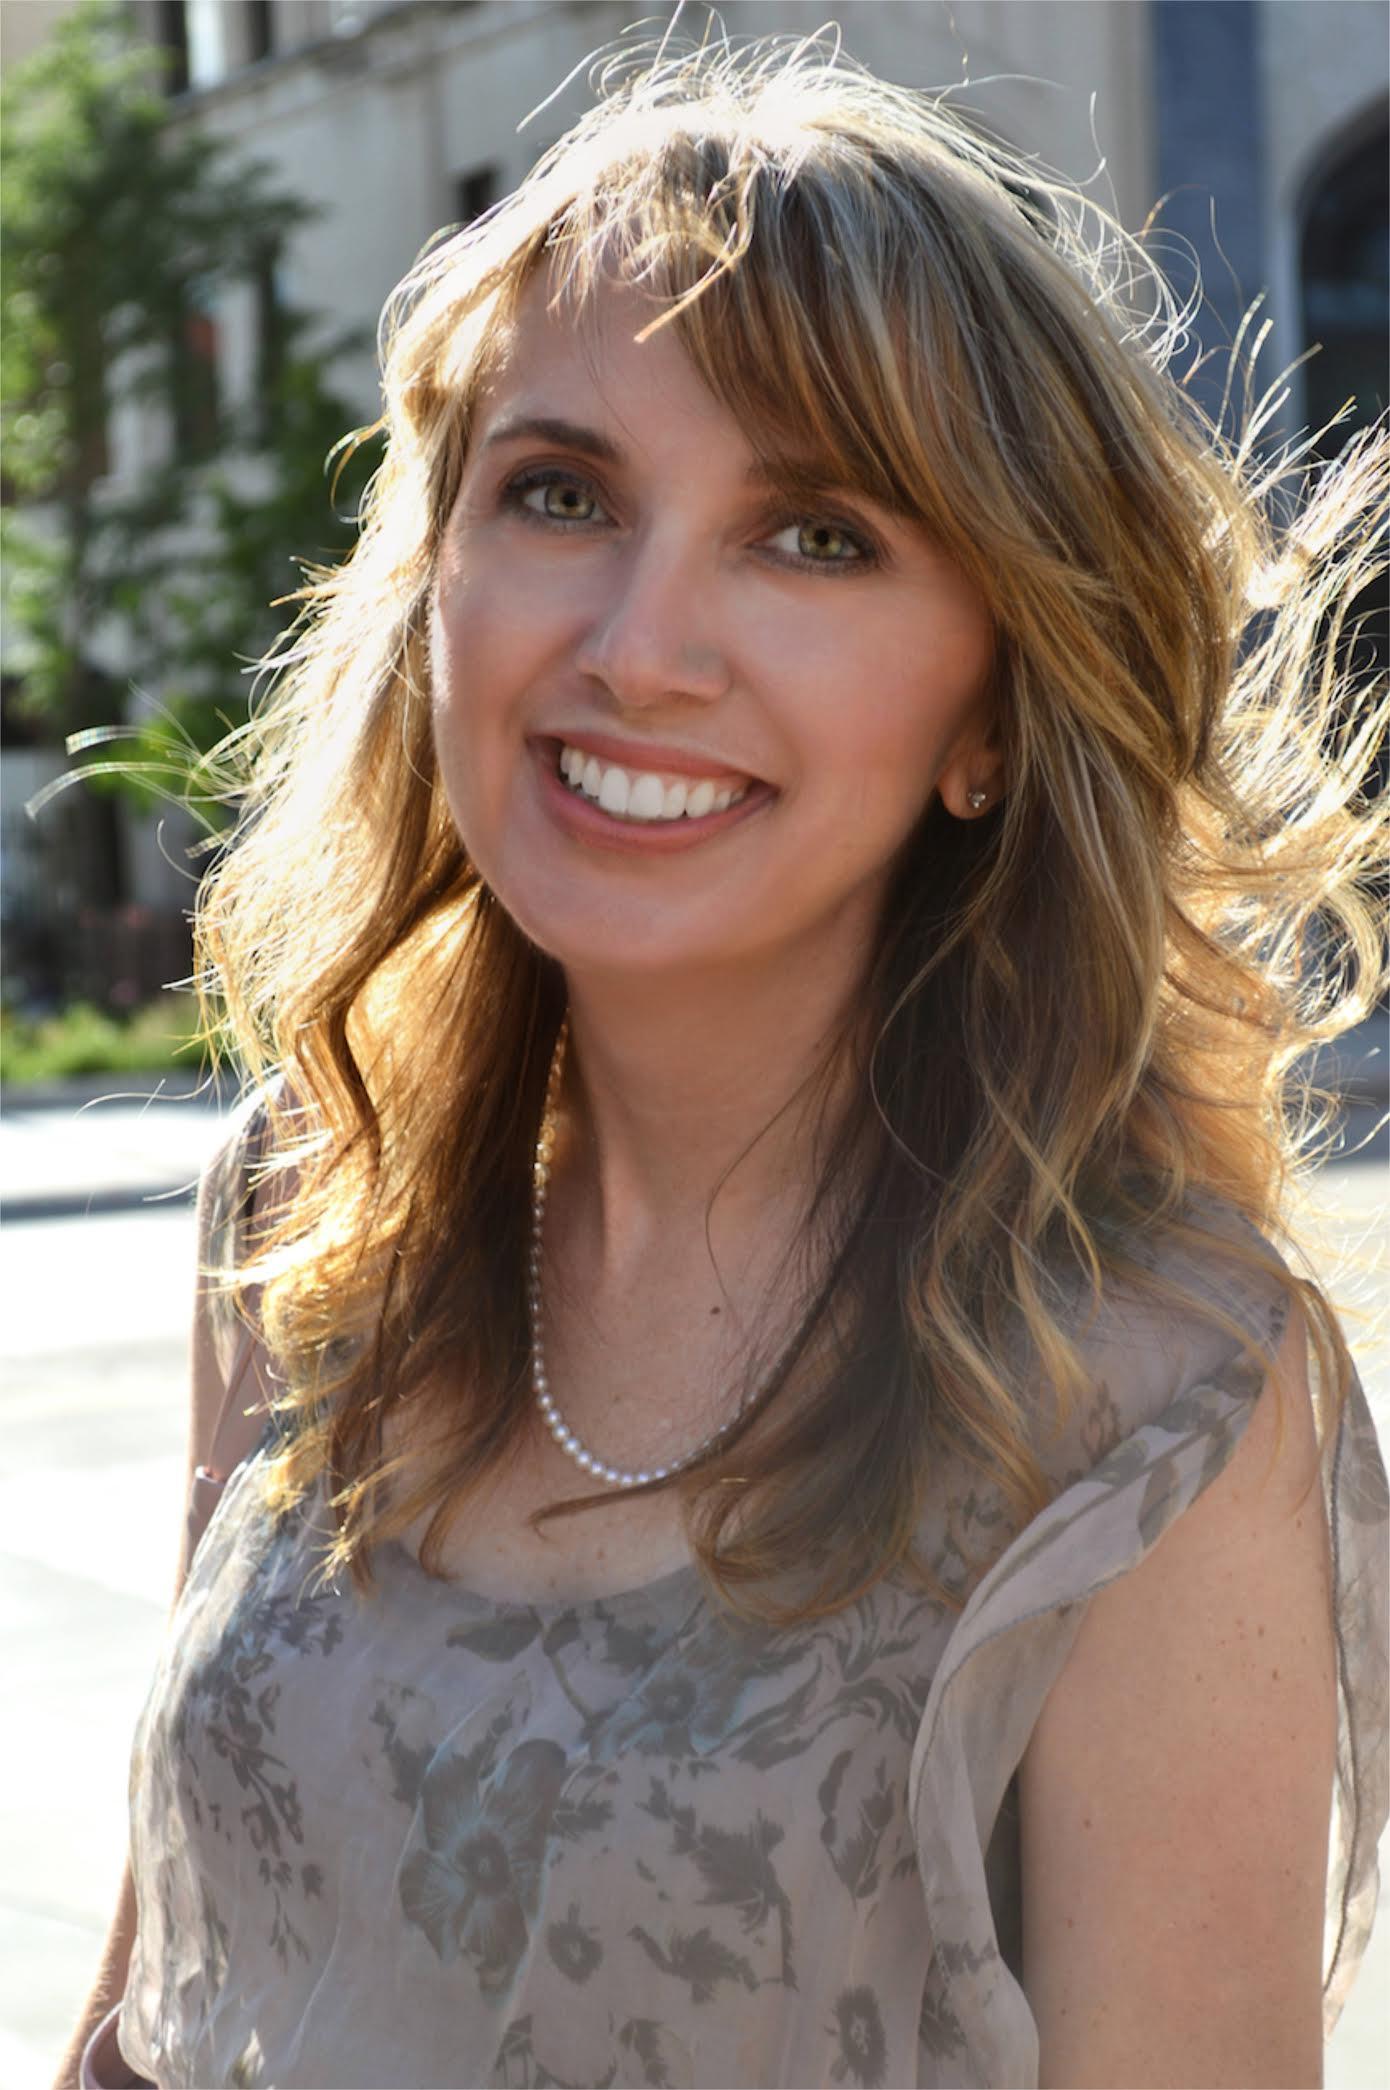 Dr. Deborah Walters, Naturopath, Homeopath